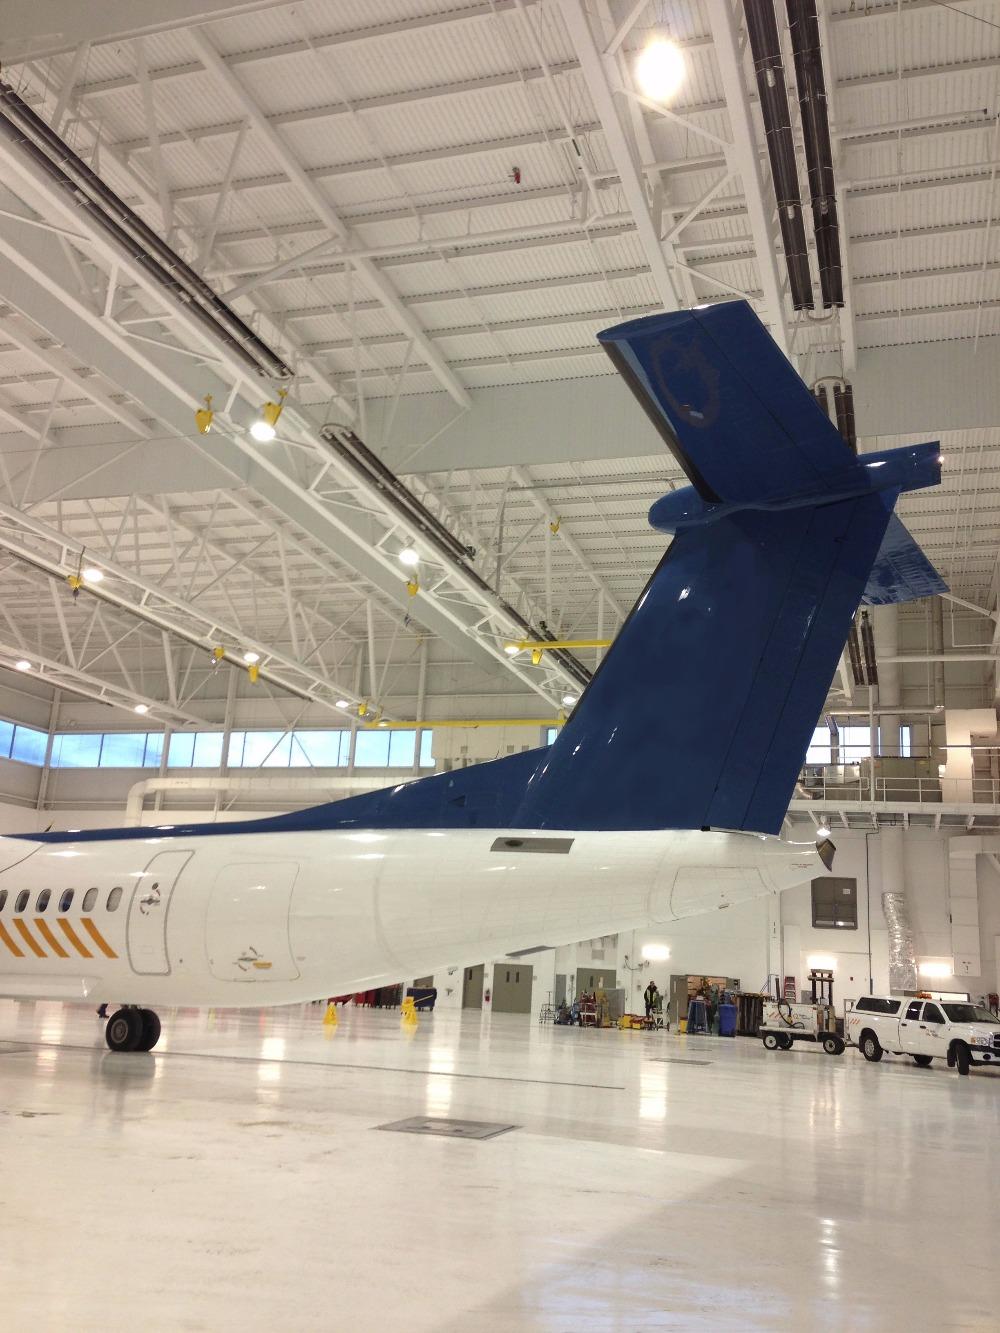 Airplane Hangar Heating | Tube Heaters Aircraft Hangar | Infrared Tube Heaters in Hangar